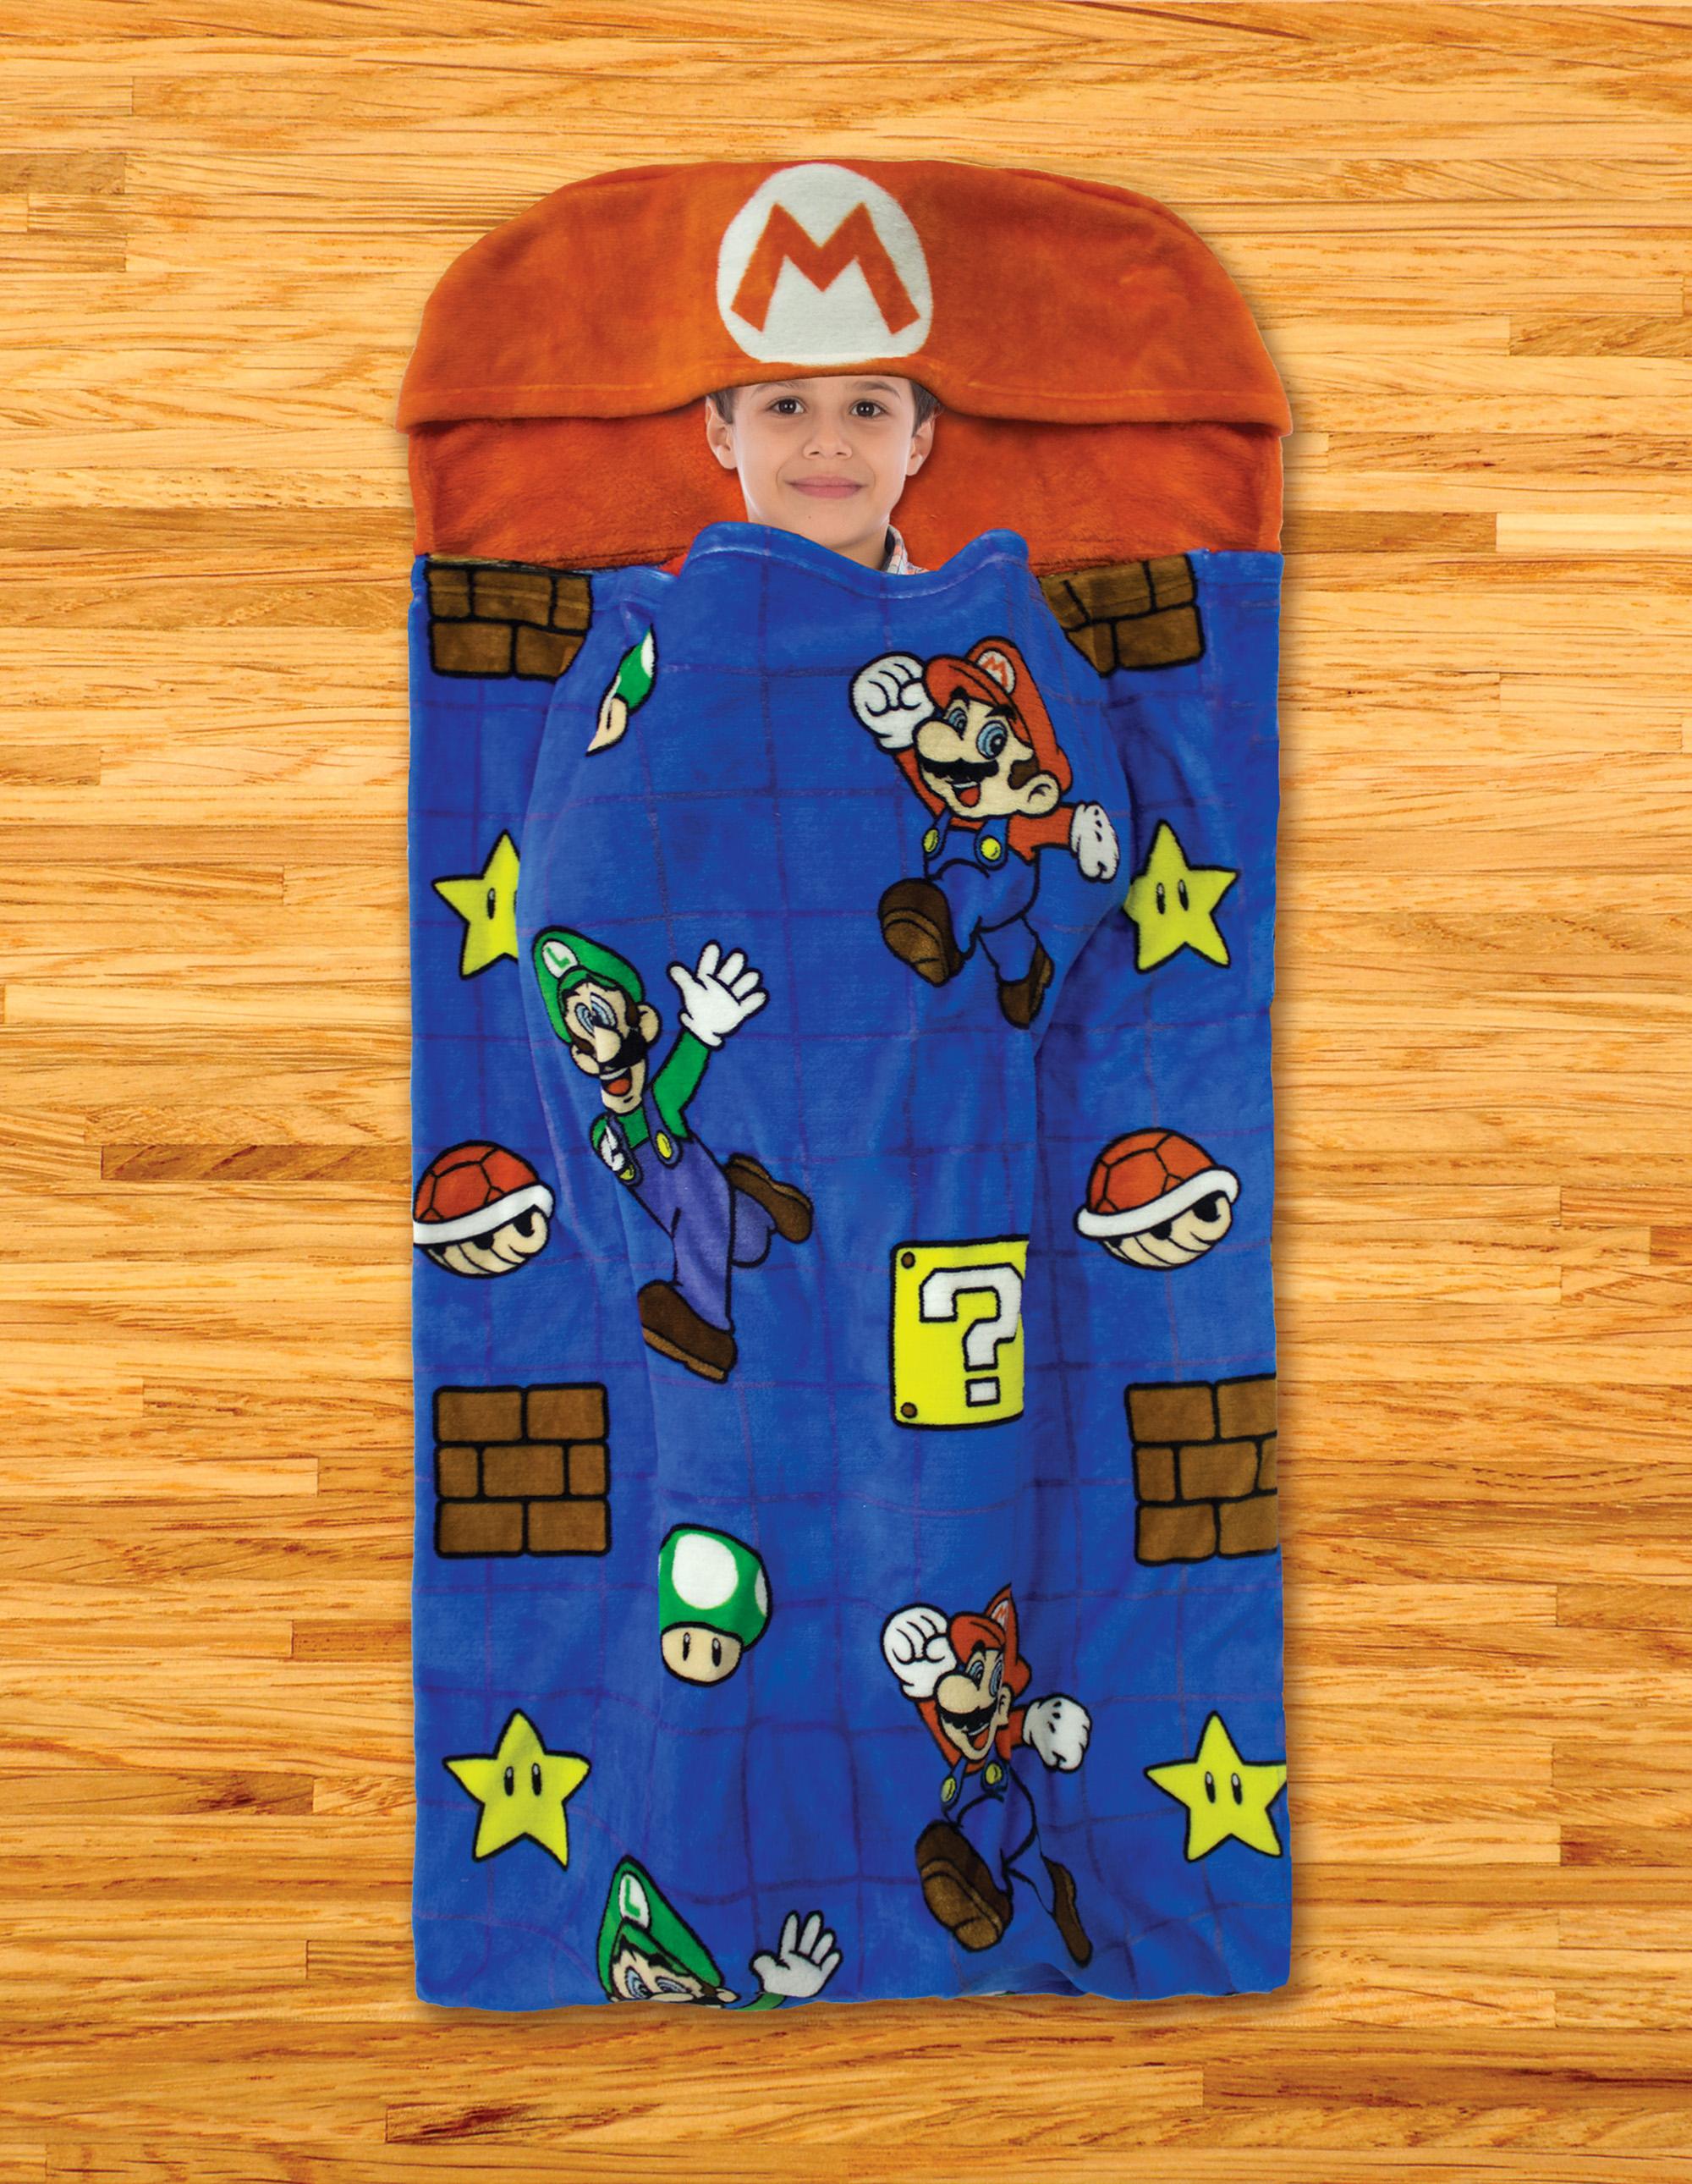 "30"" x 54"" Kids' Step-In Blanket Slumber Bags (Super Mario, L.O.L. Surprise!, Paw Patrol & More) $8.88 + Free Store Pickup at Walmart"